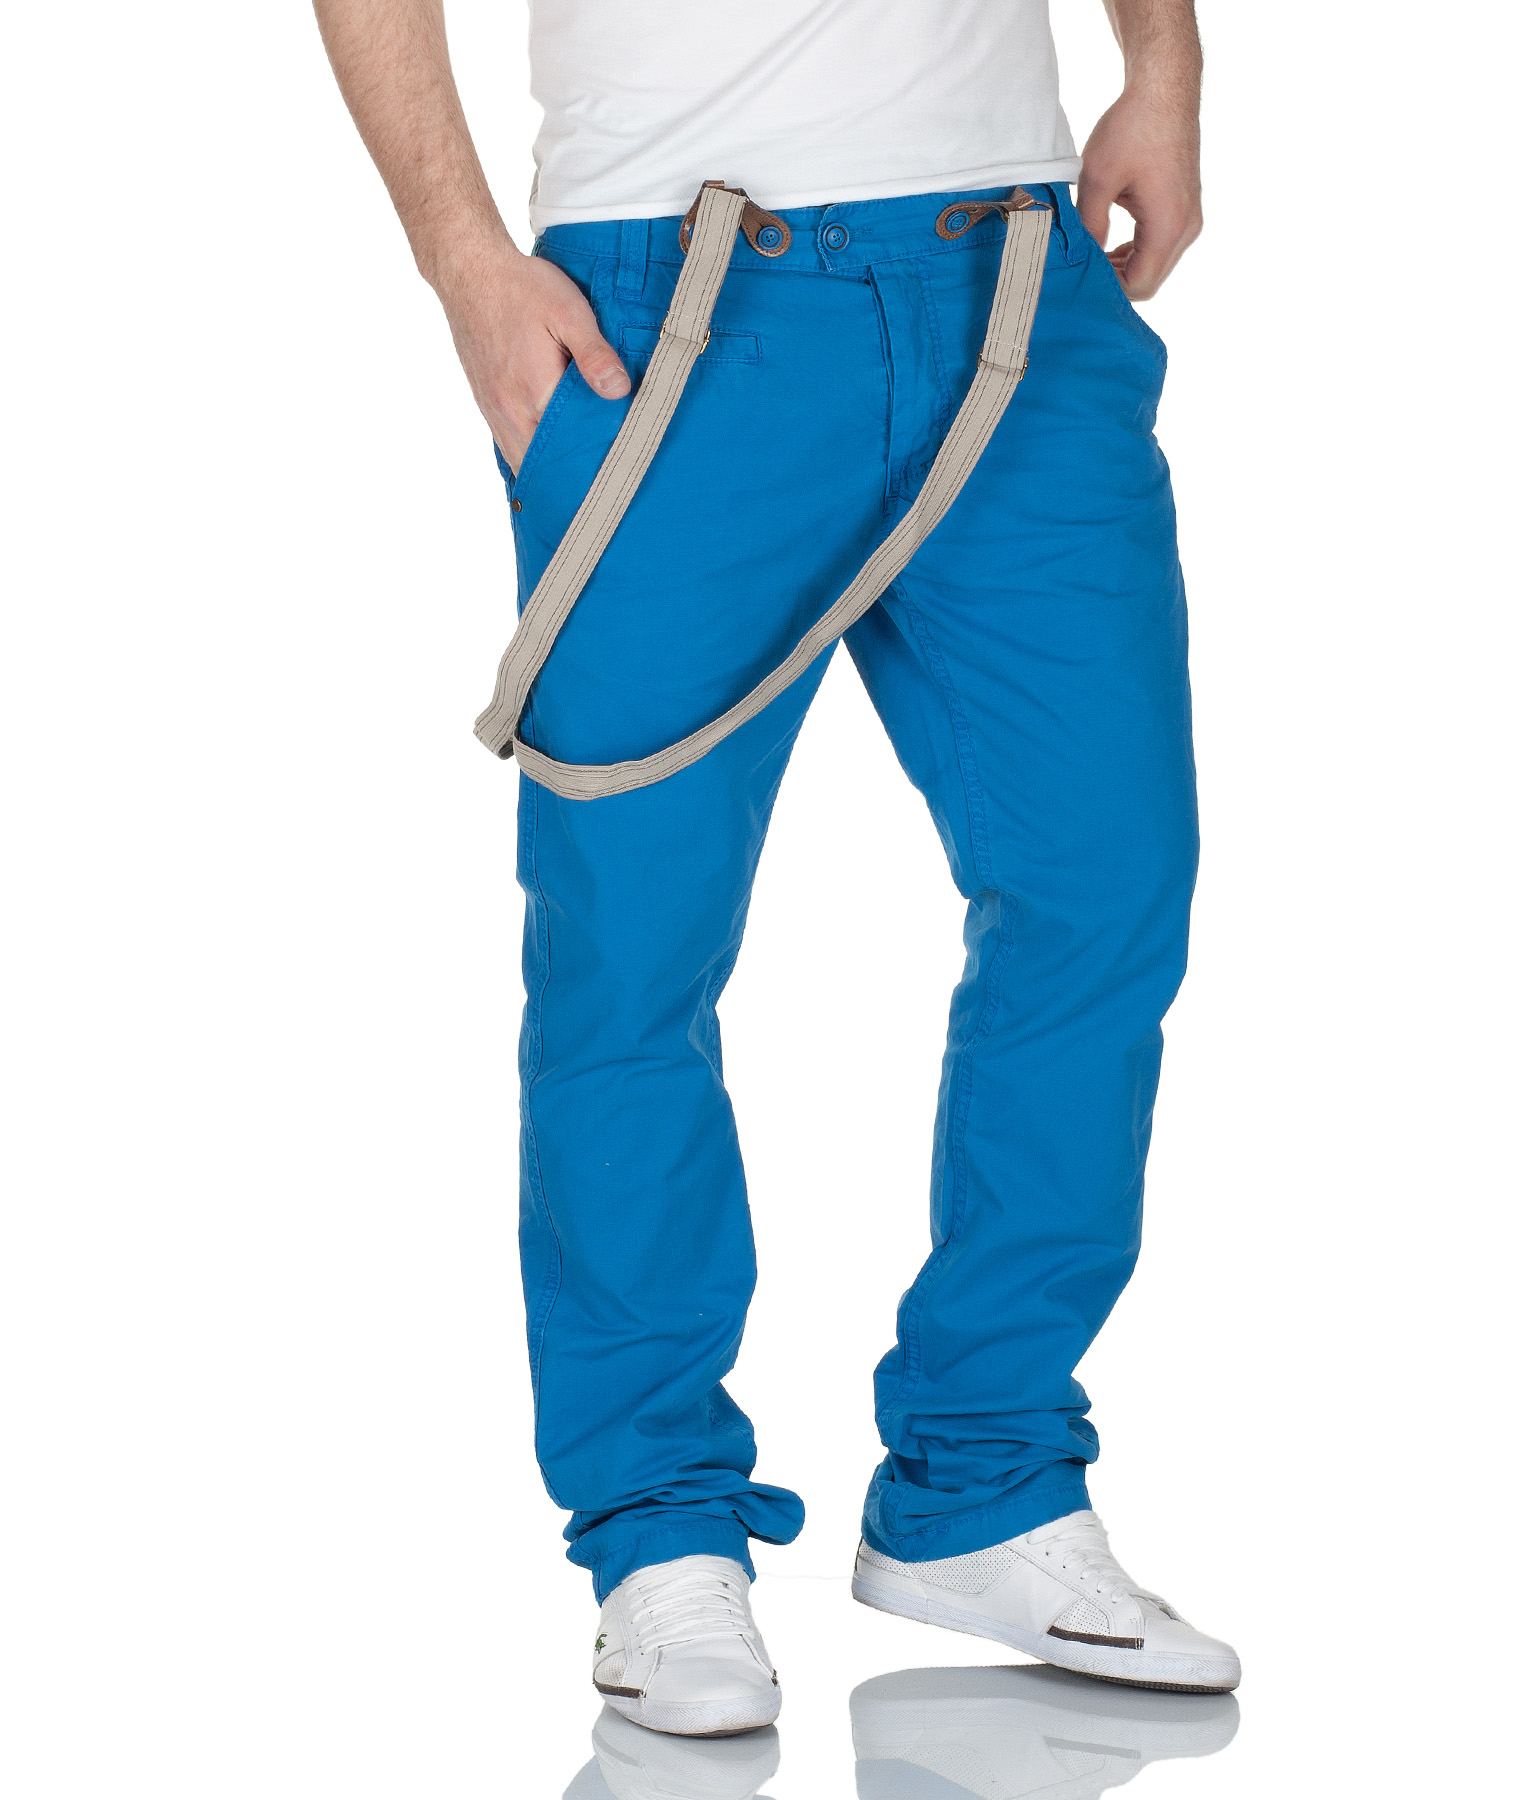 urban surface herren chino hose mit hosentr ger by eight2nine jeans mod 3576 d g ebay. Black Bedroom Furniture Sets. Home Design Ideas